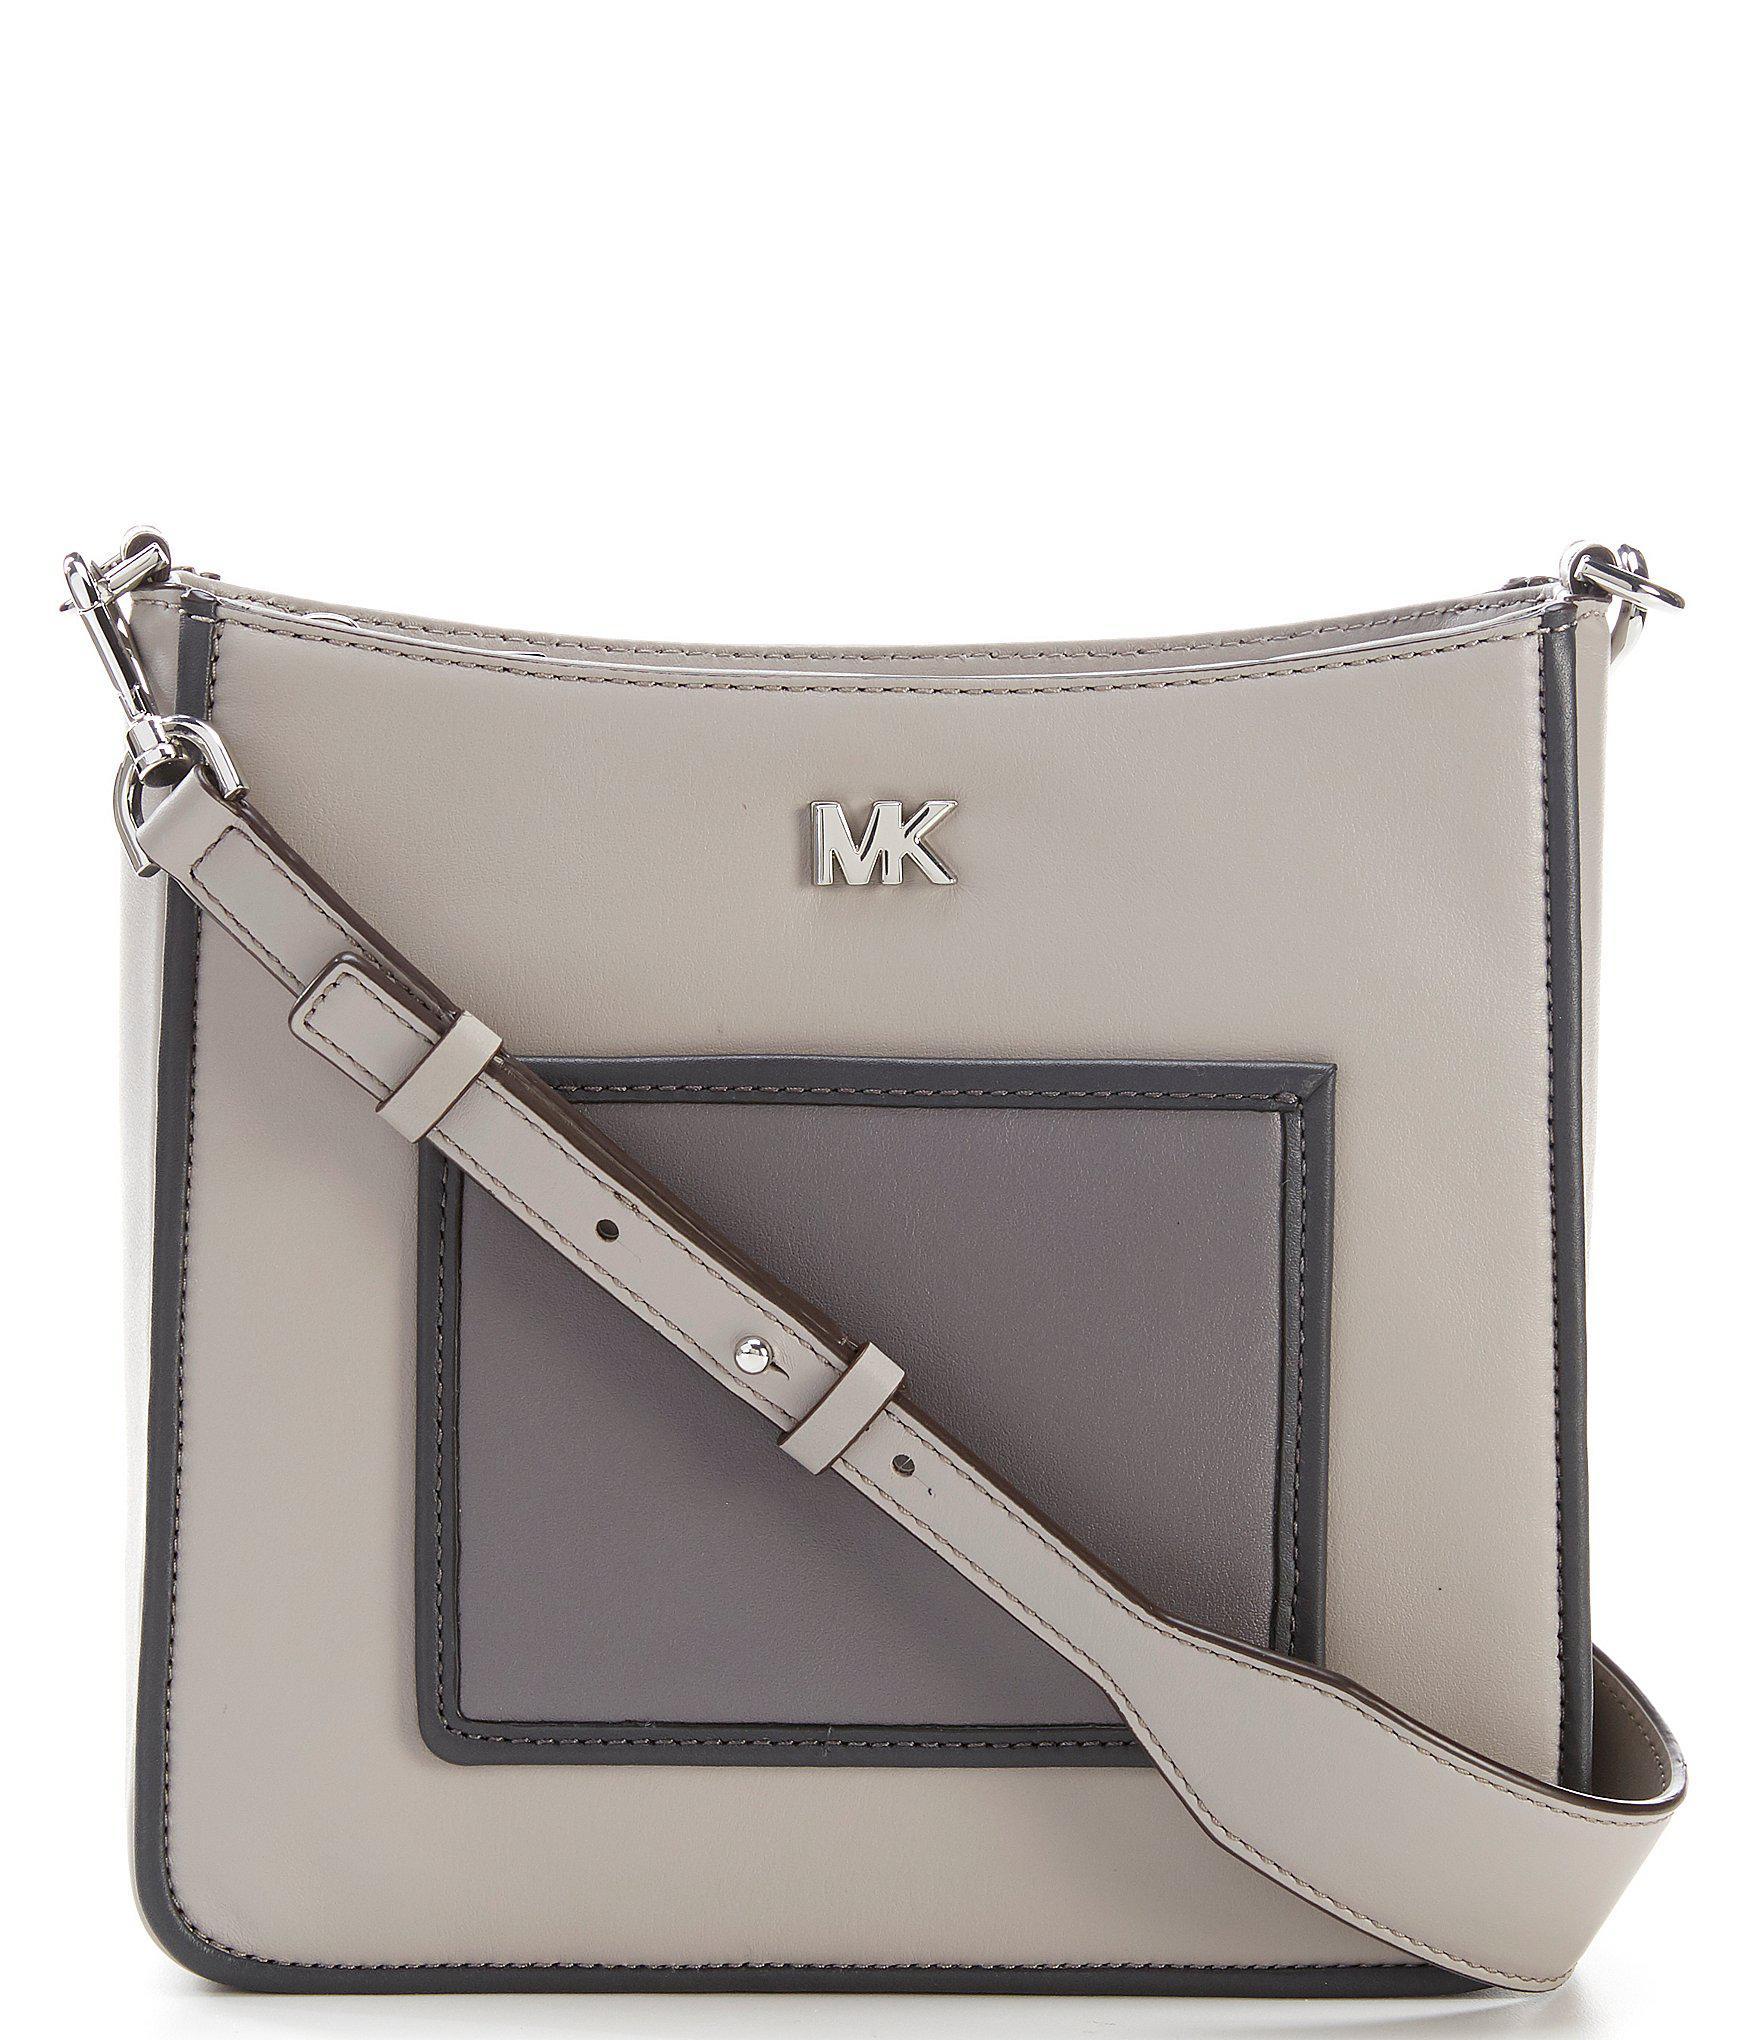 1fccff6f3bcd MICHAEL Michael Kors Gloria Pocket Cross-body Bag in Gray - Lyst